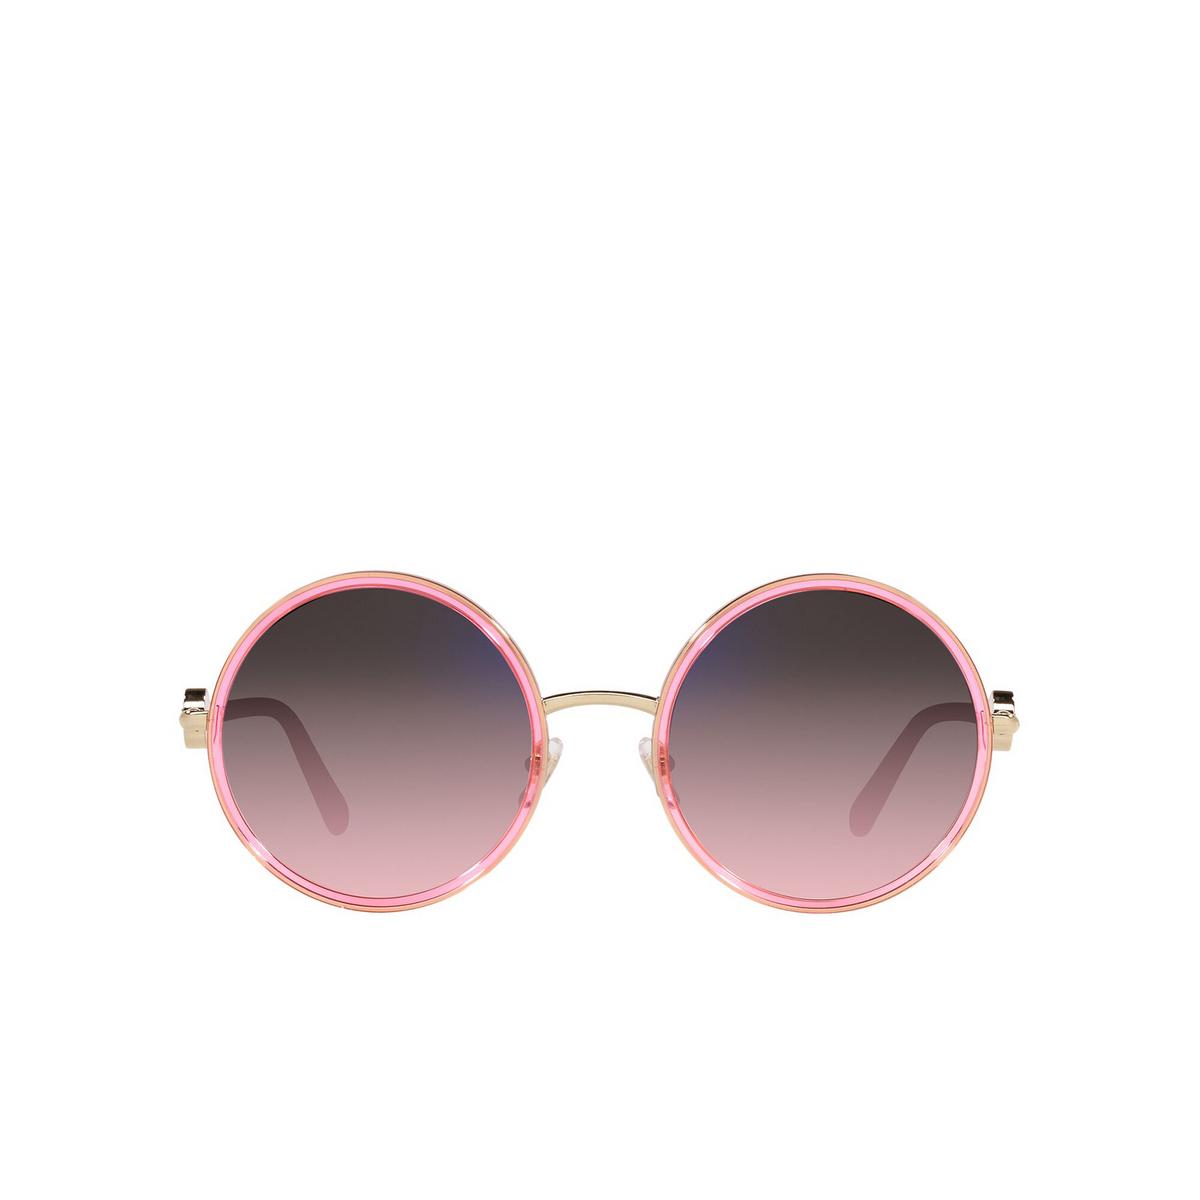 Versace® Round Sunglasses: VE2229 color Transparent Pink 1252H9 - front view.